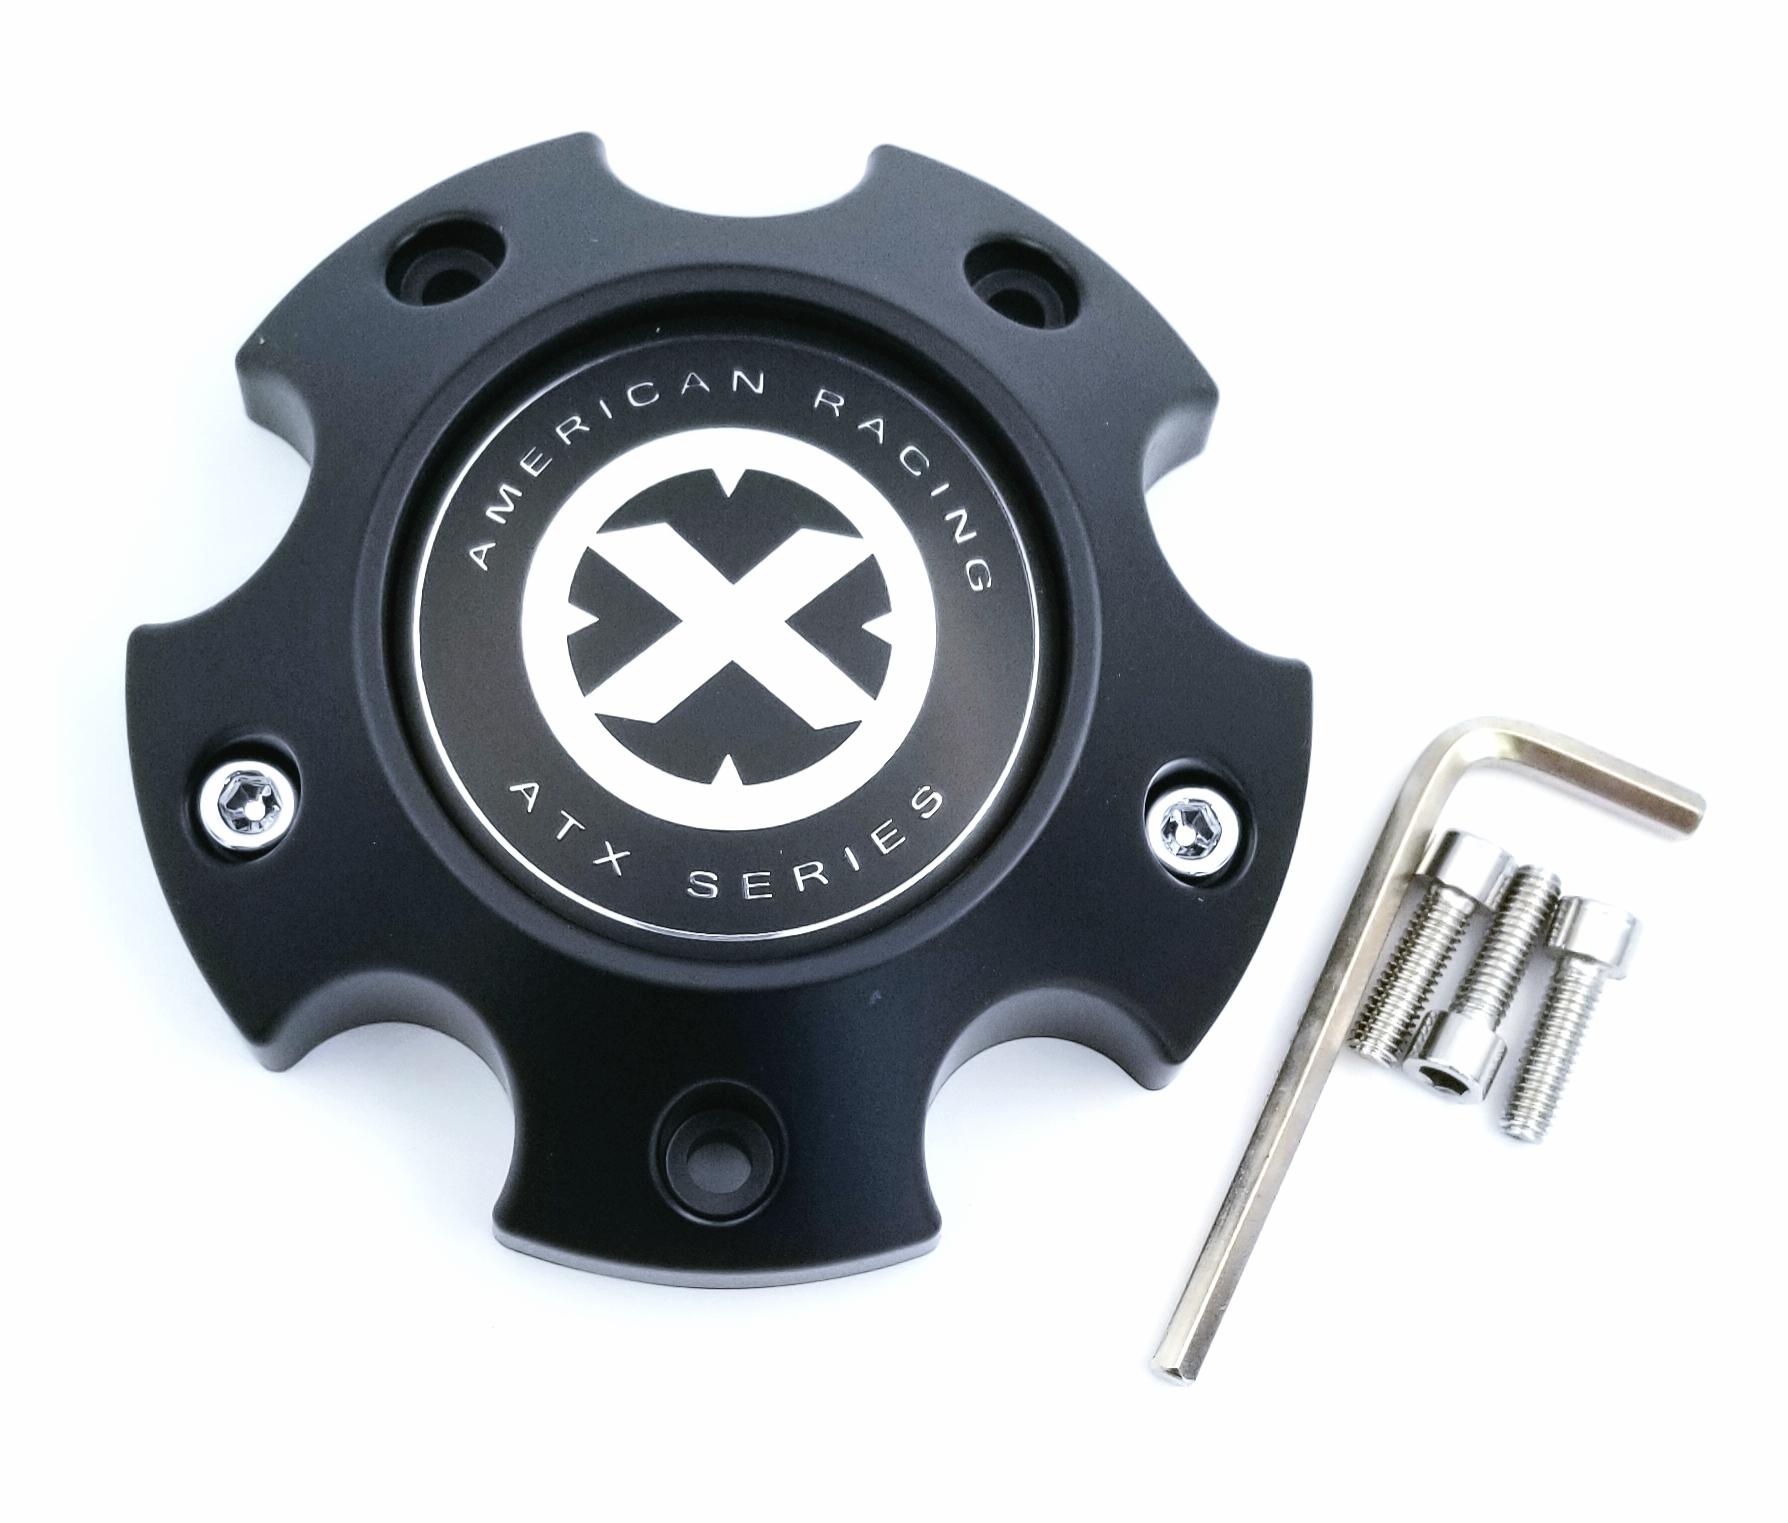 14pcs Wheel Bolts//Washers Steel for American Racing ATX Series AX200 YUKON